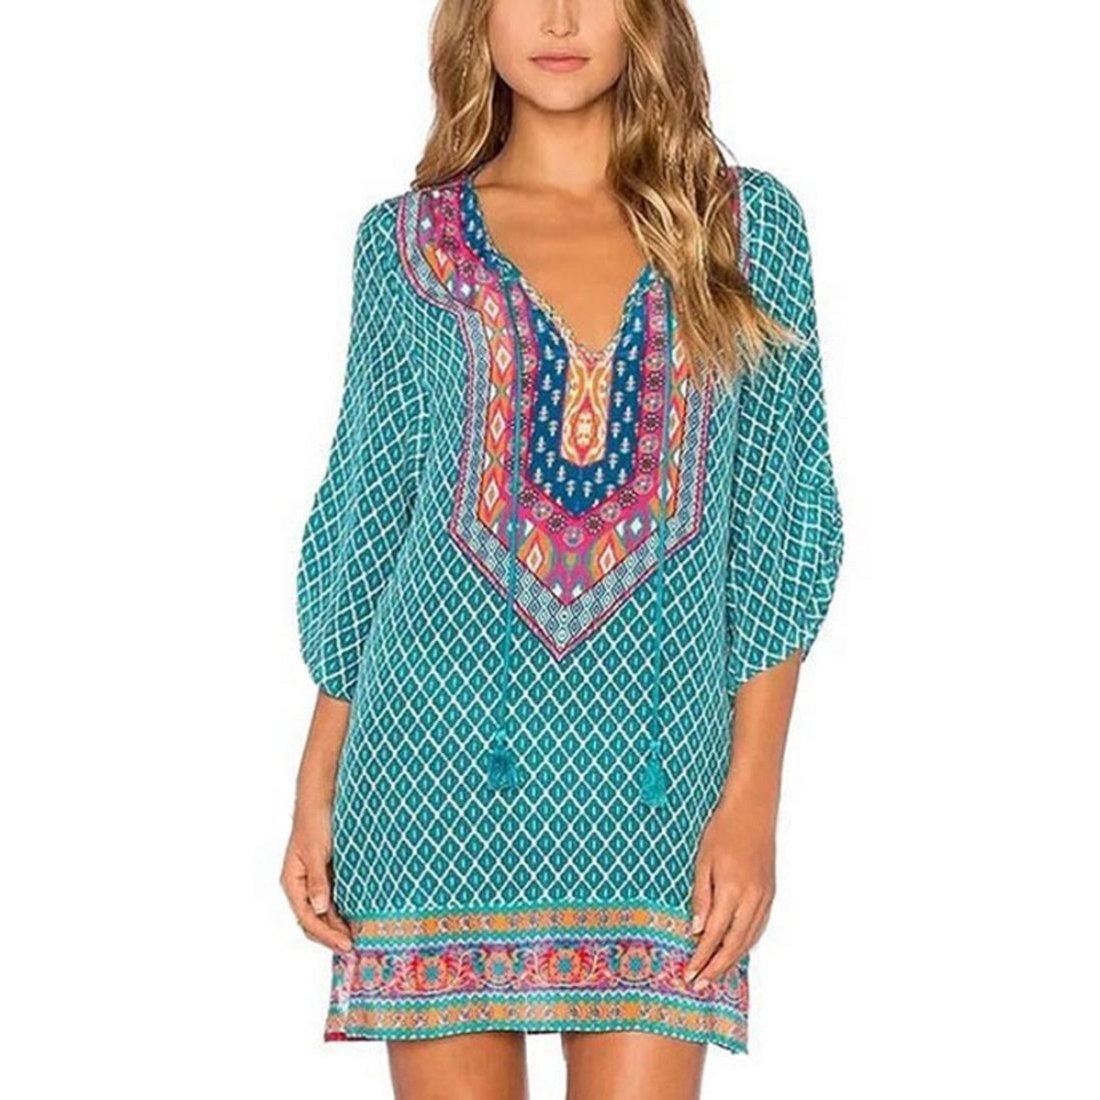 GONKOMA Women Geometric Pattern Boho Style Dress Vintage Loose Summer Dress